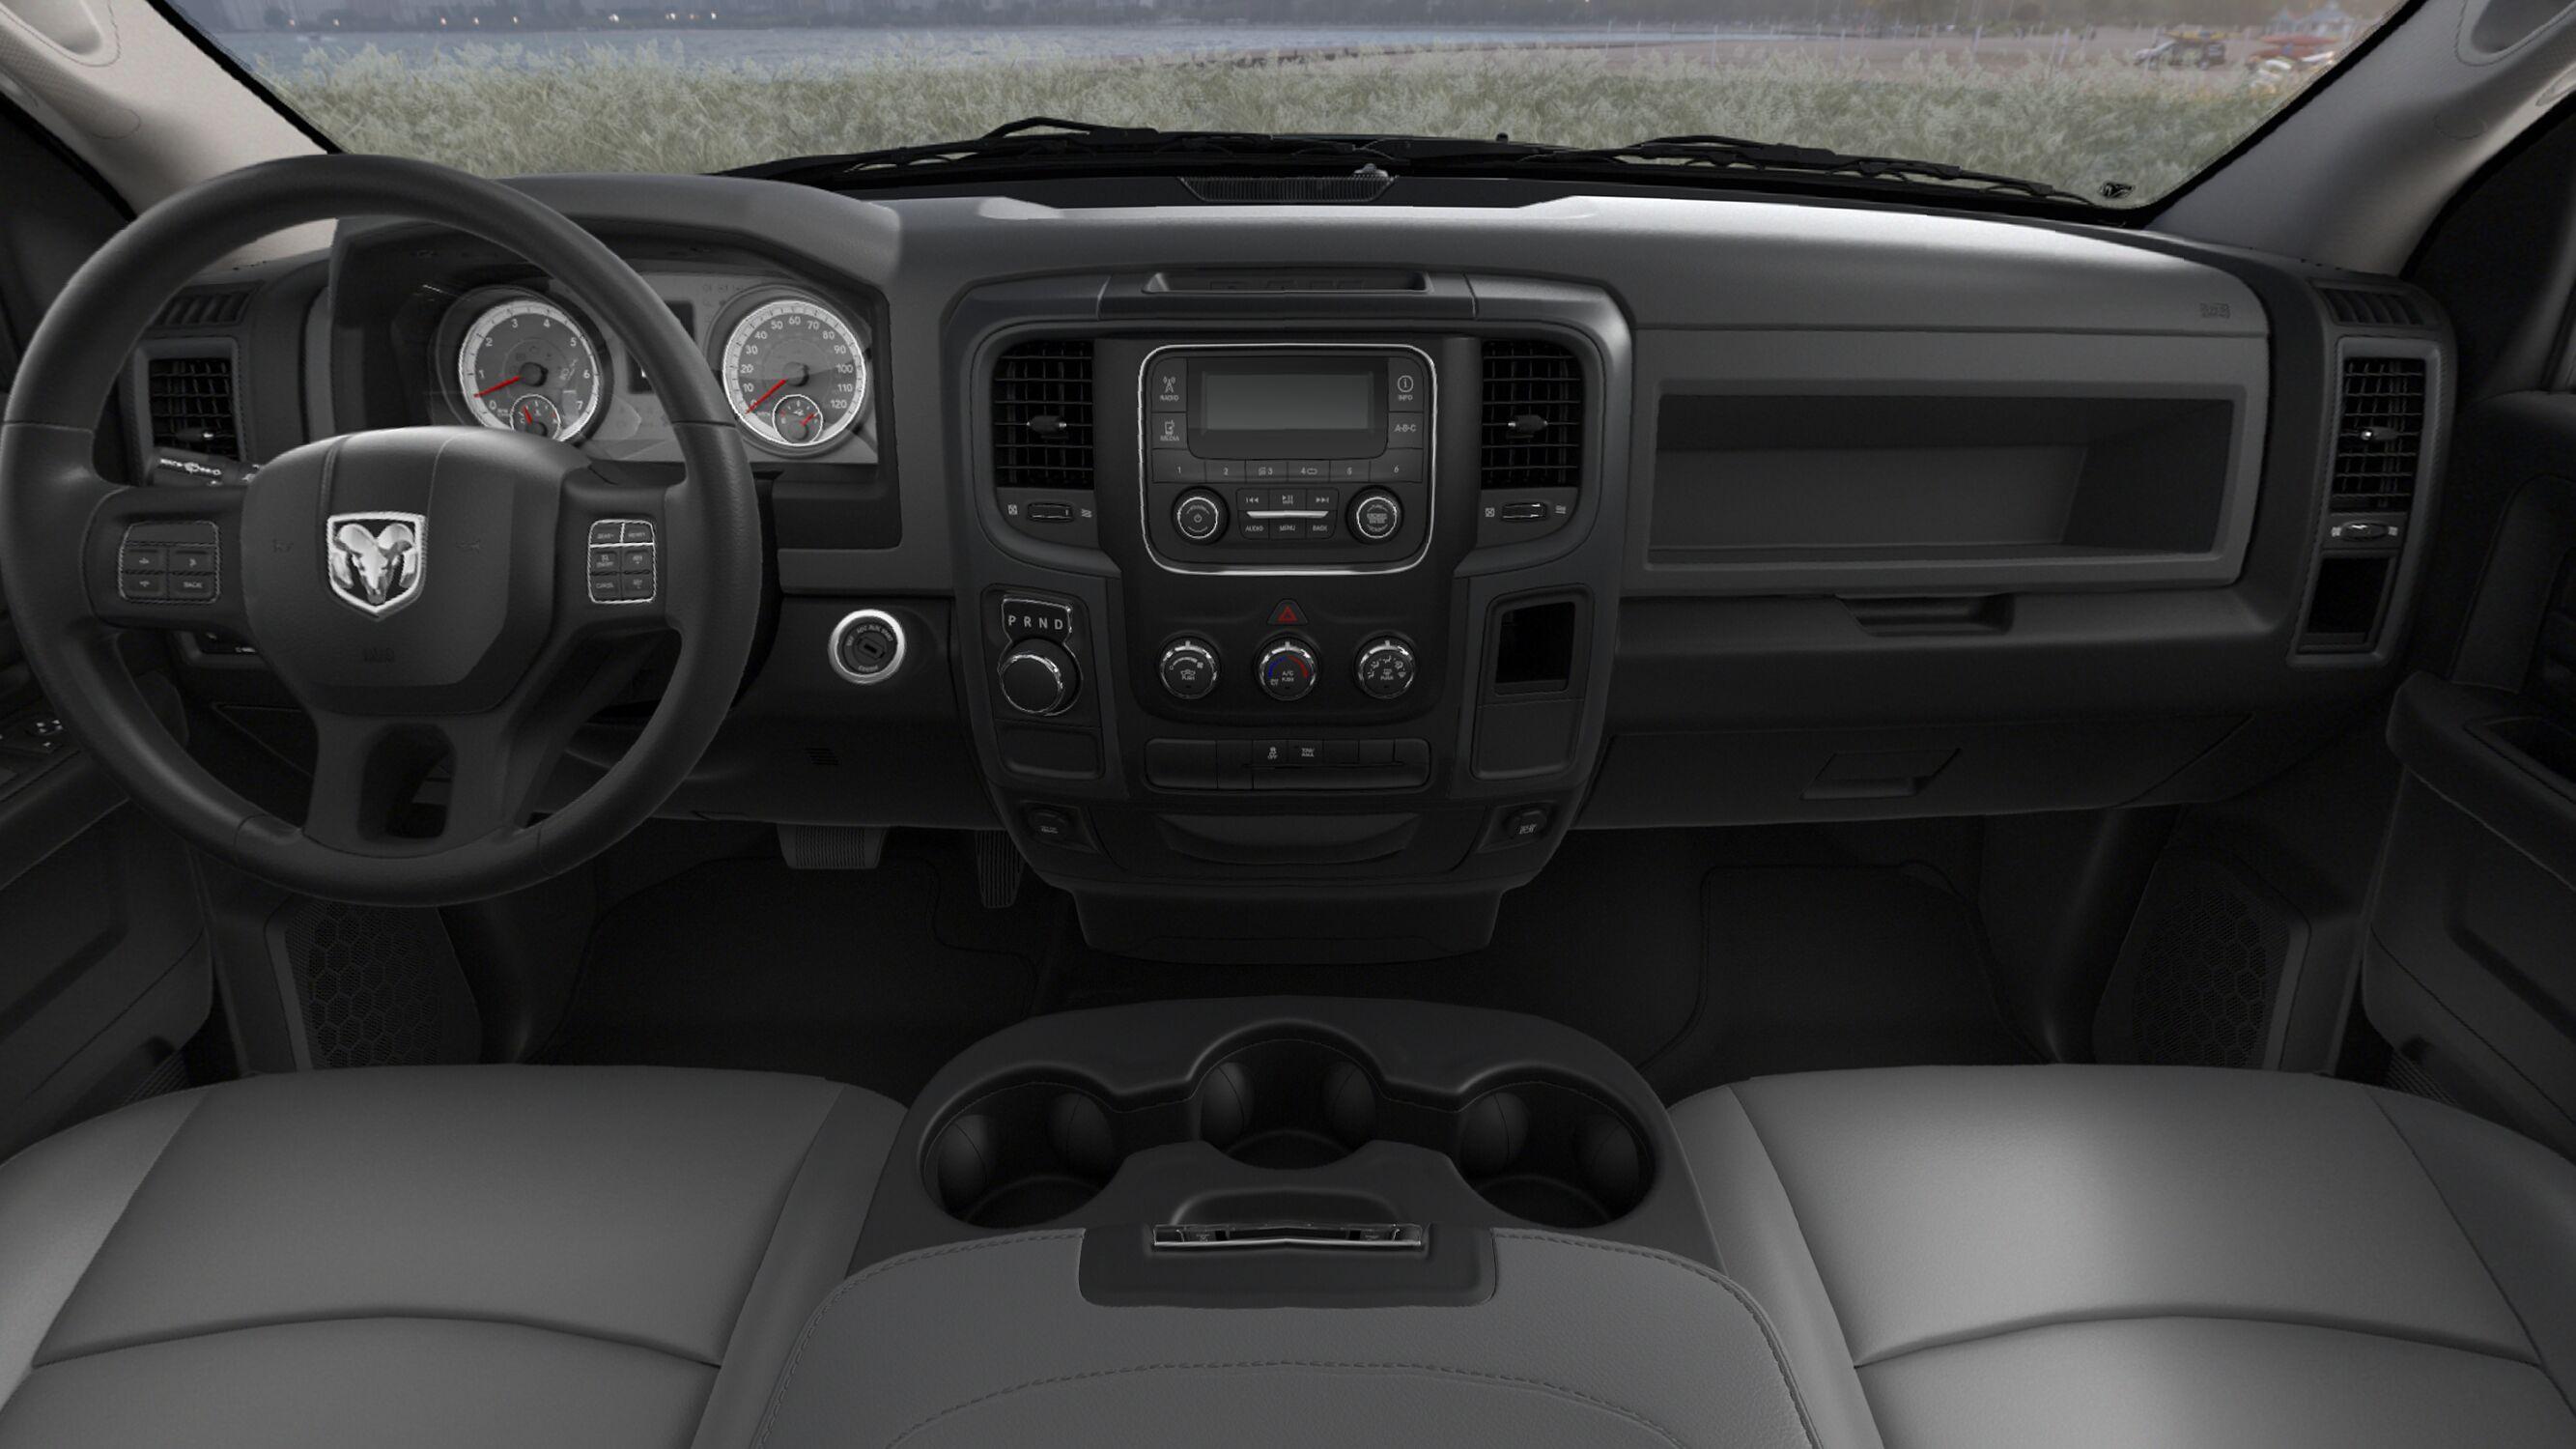 2018 Ram 1500 Express Dashboard Interior